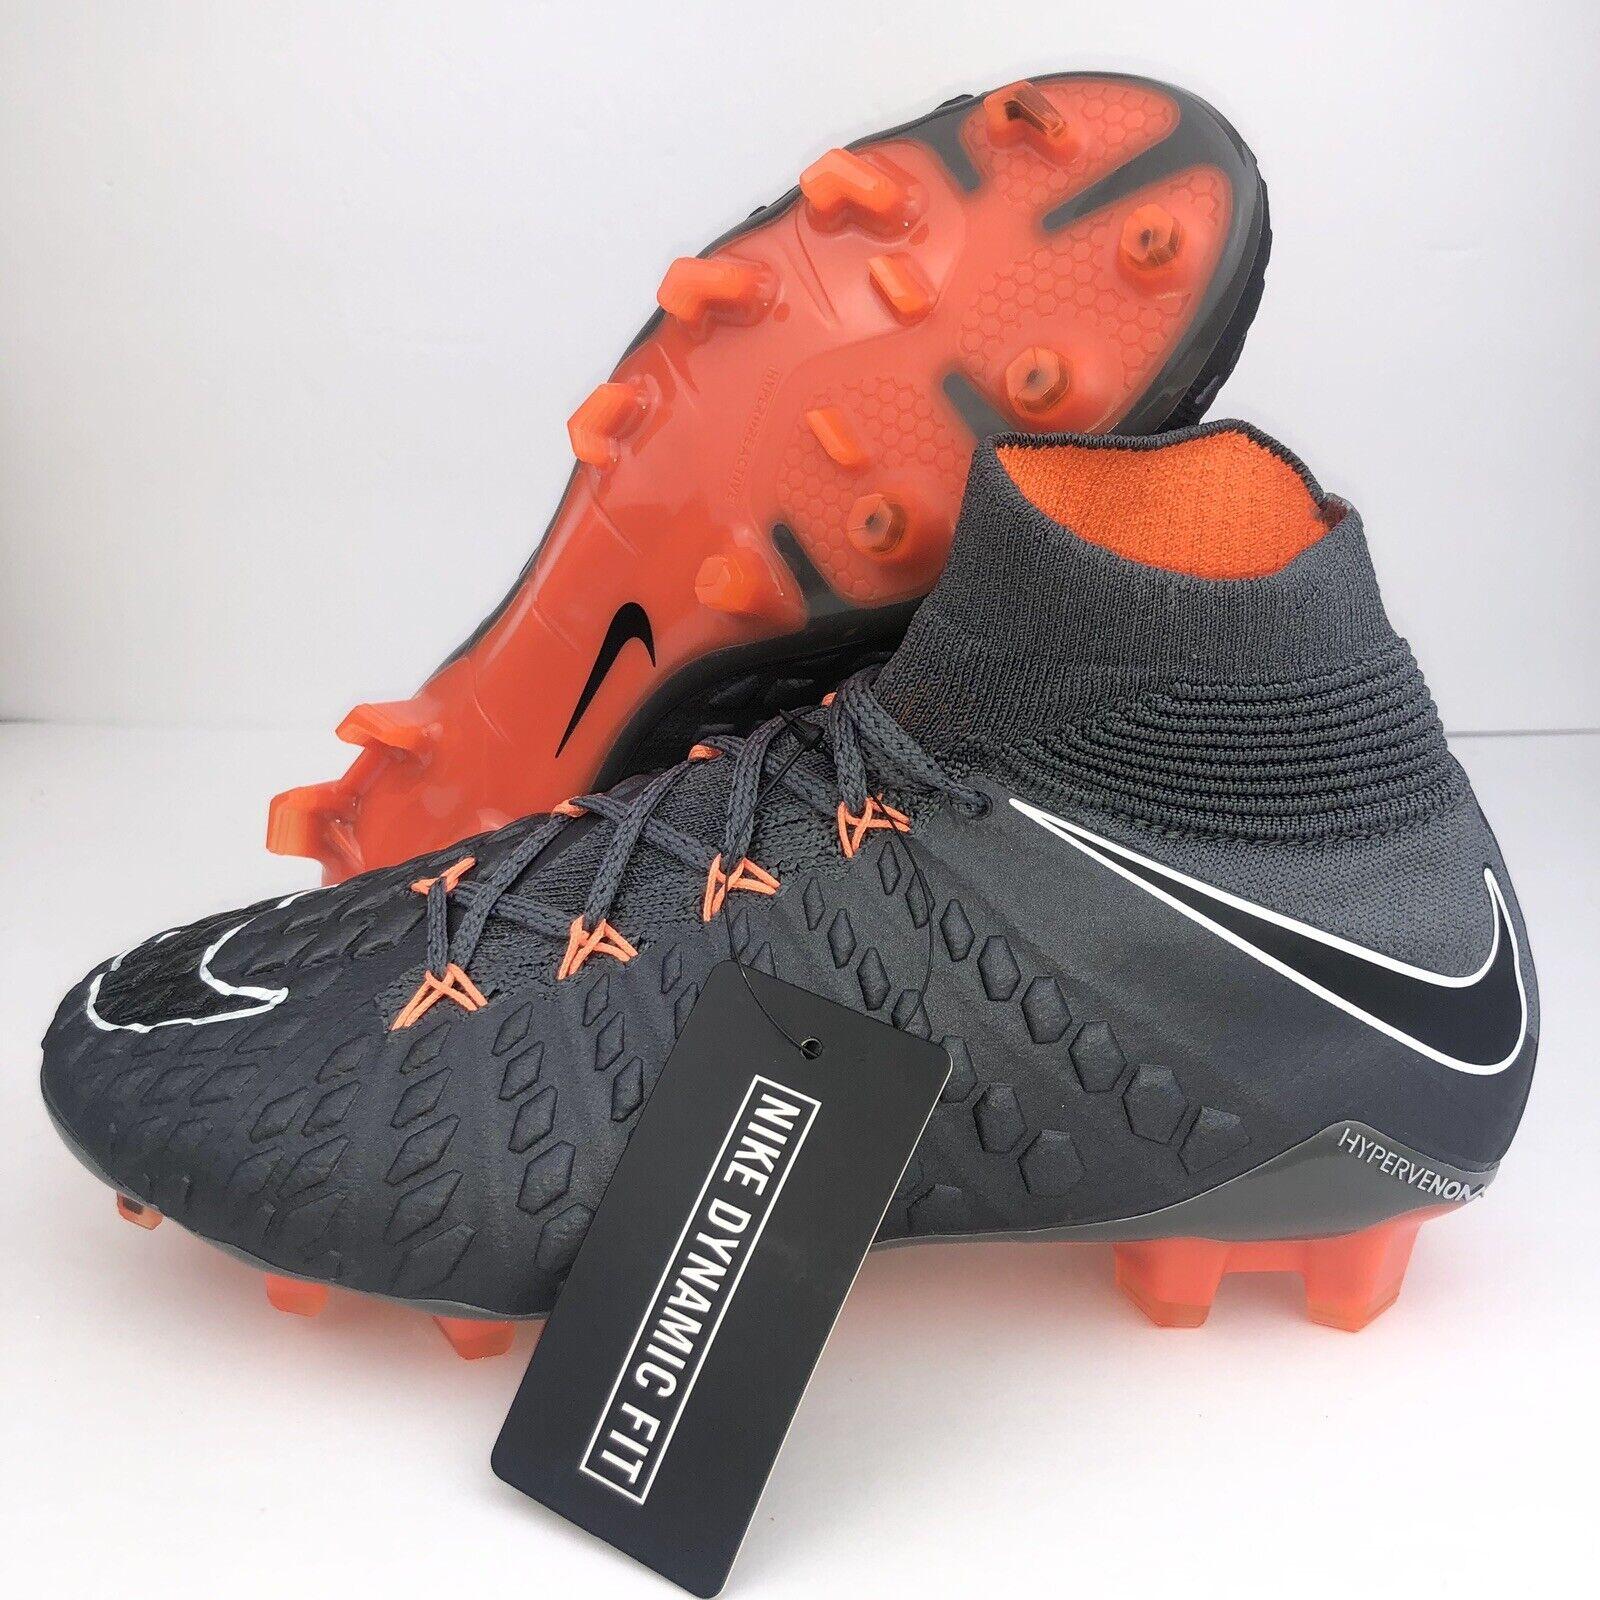 Nike  Hypervenom Fantasma 3 III Elite DF FG Talla 5.5 Tacos Naranja gris AH7270 081  calidad oficial